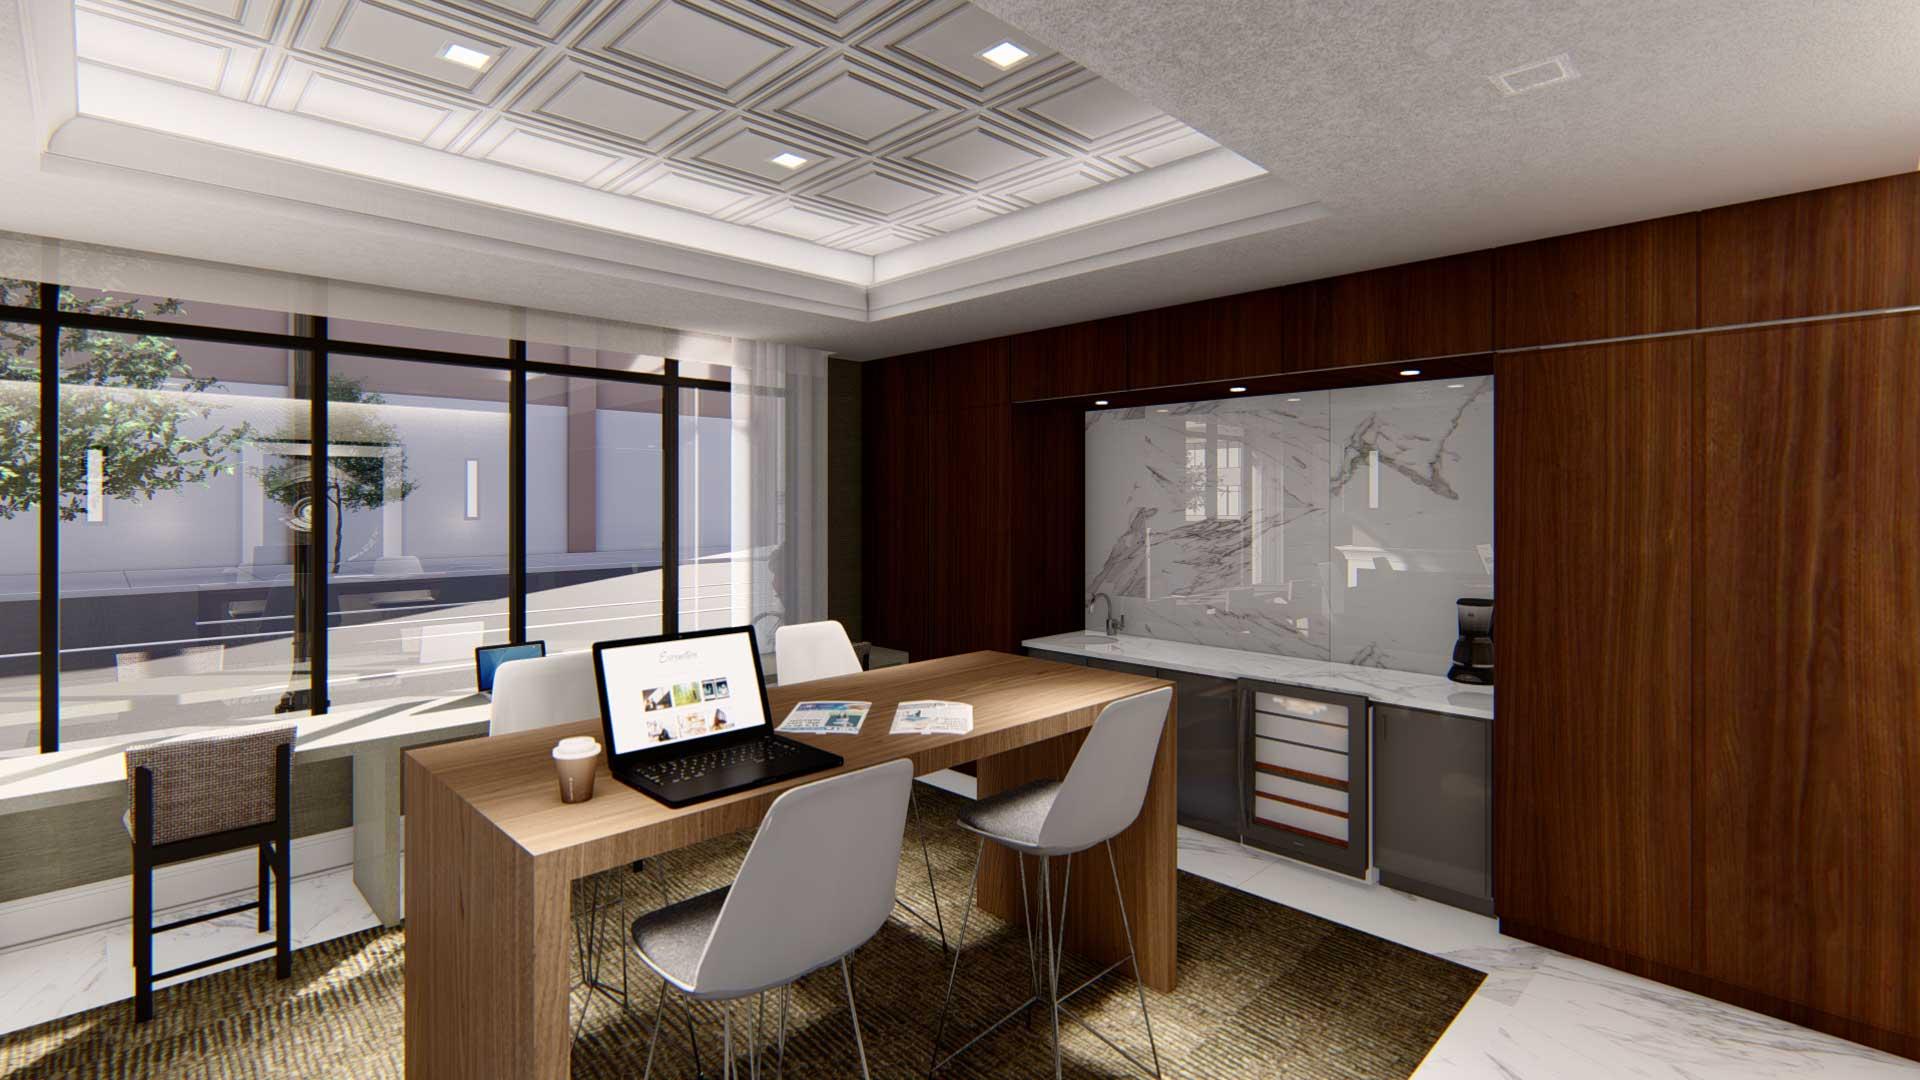 Billings Place office rendering